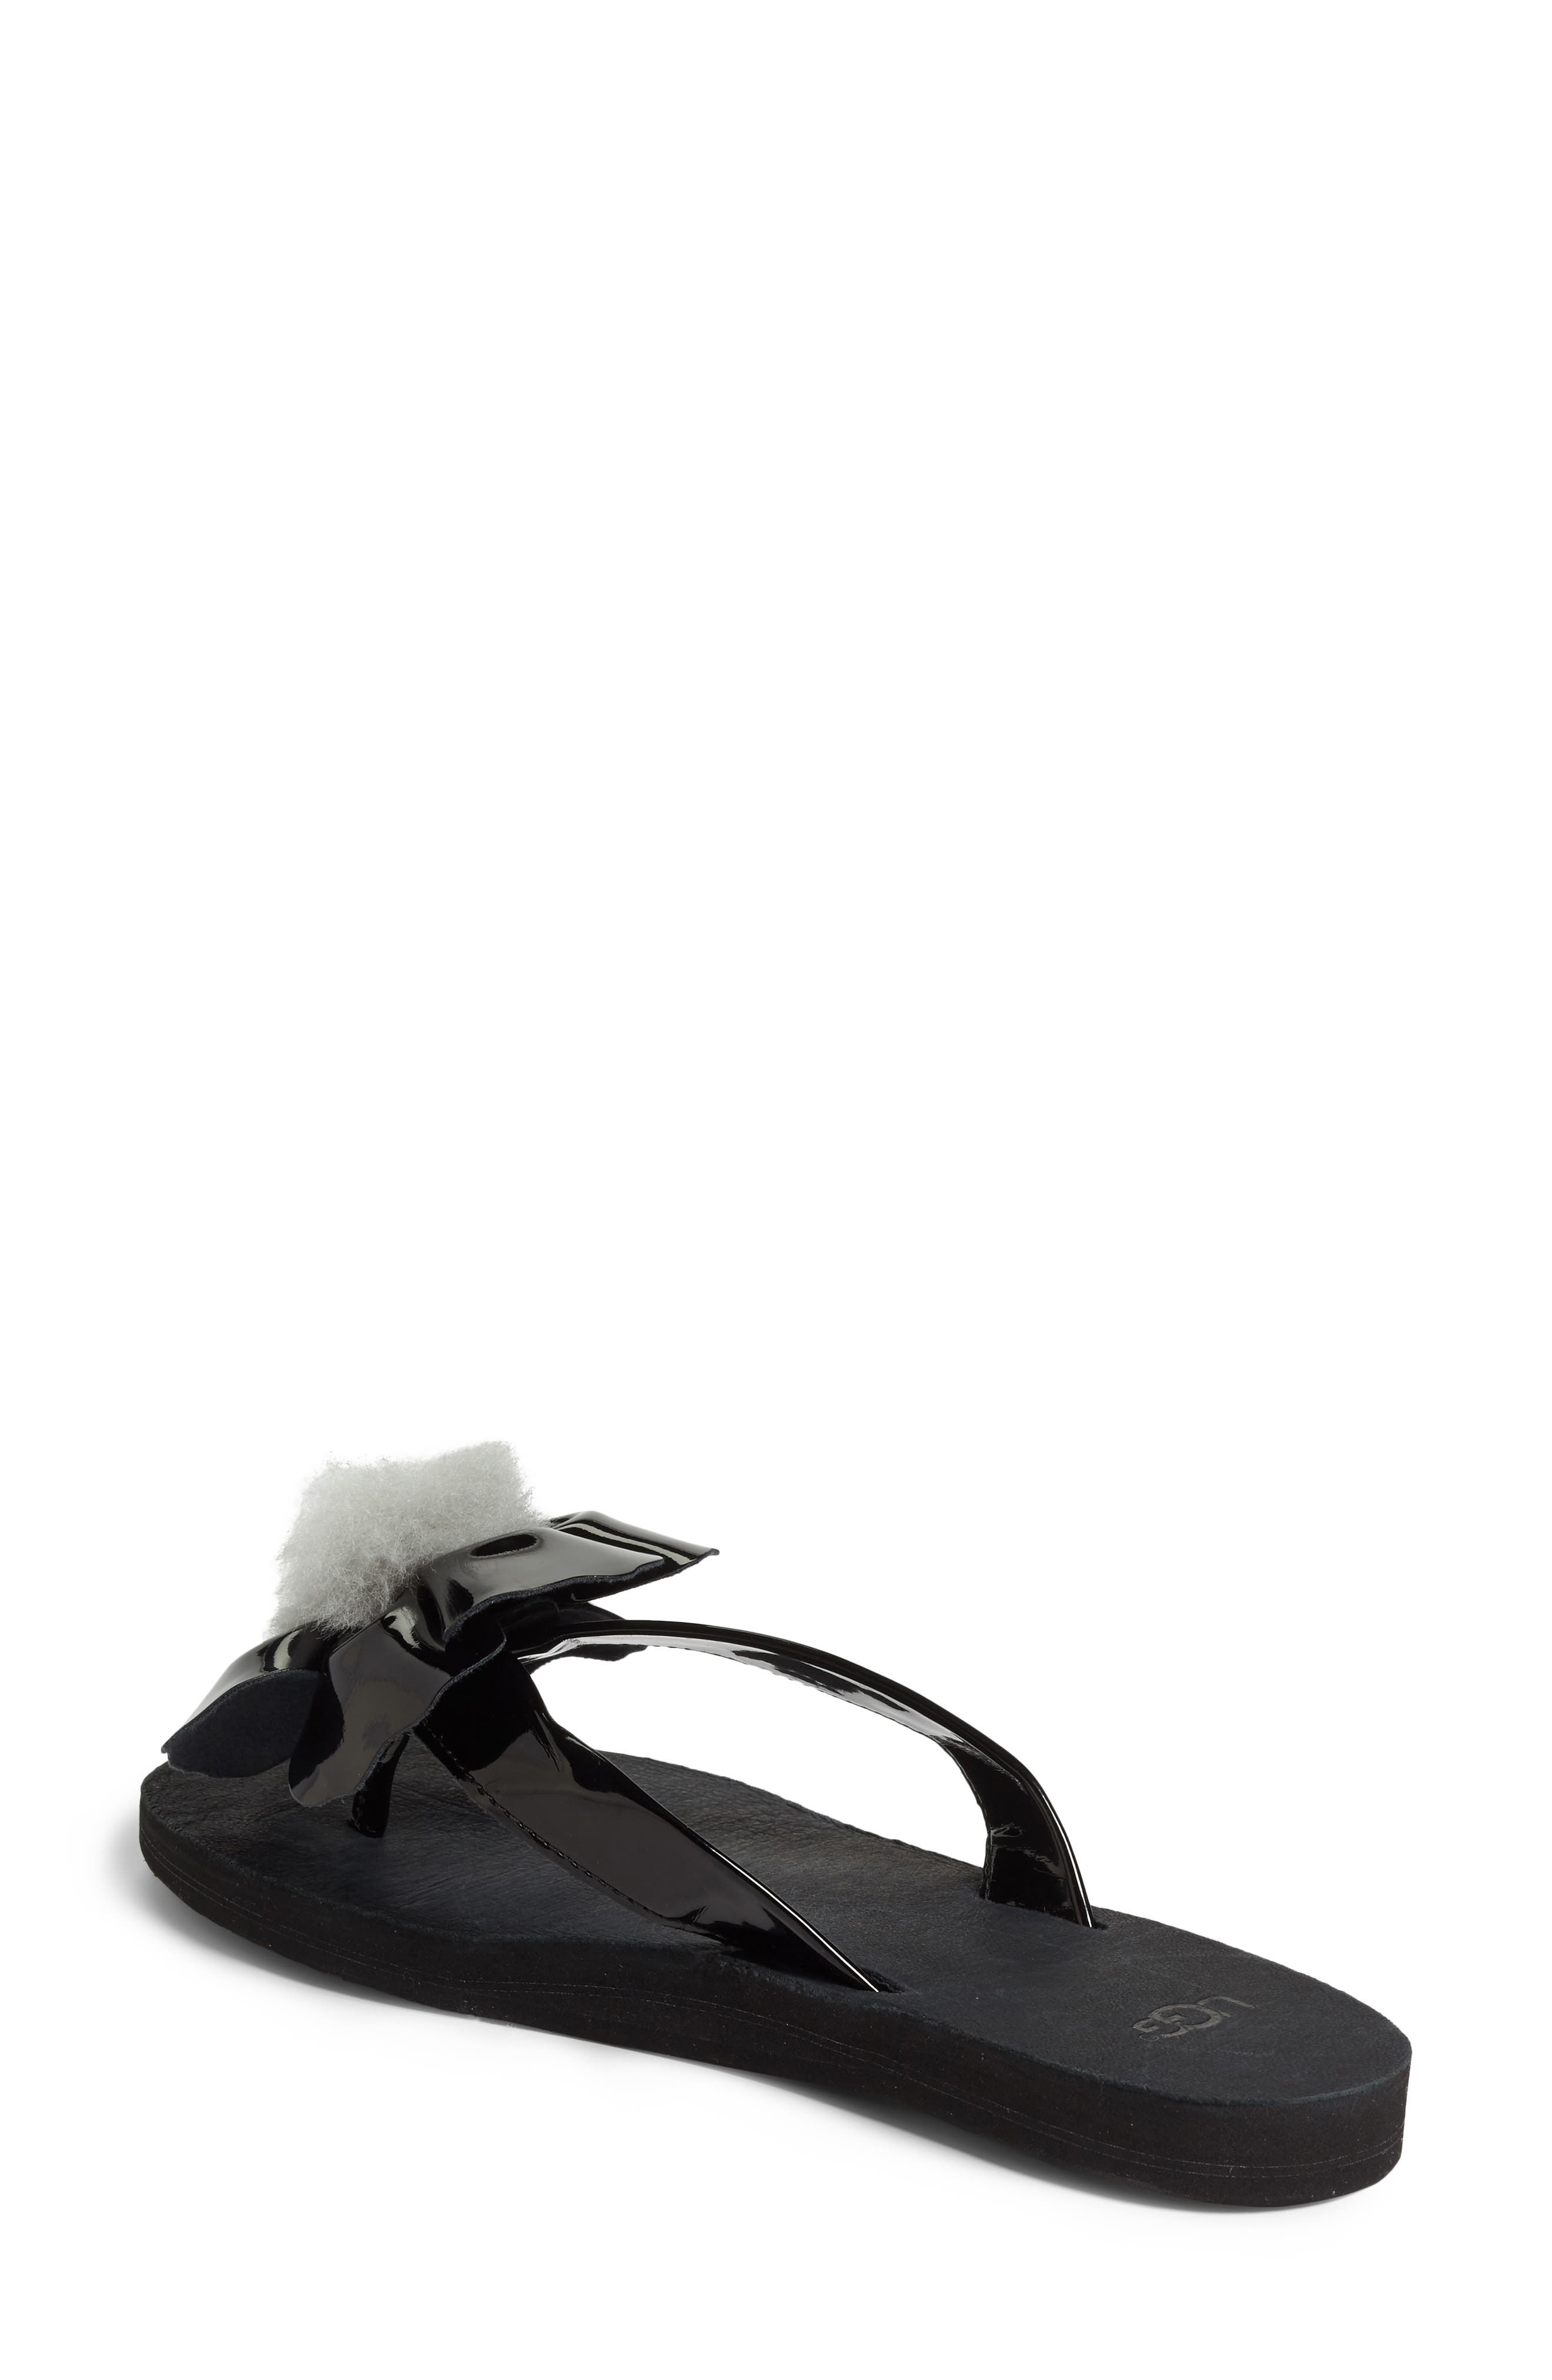 Poppy Genuine Shearling Pompom Flip Flop,                             Alternate thumbnail 2, color,                             001